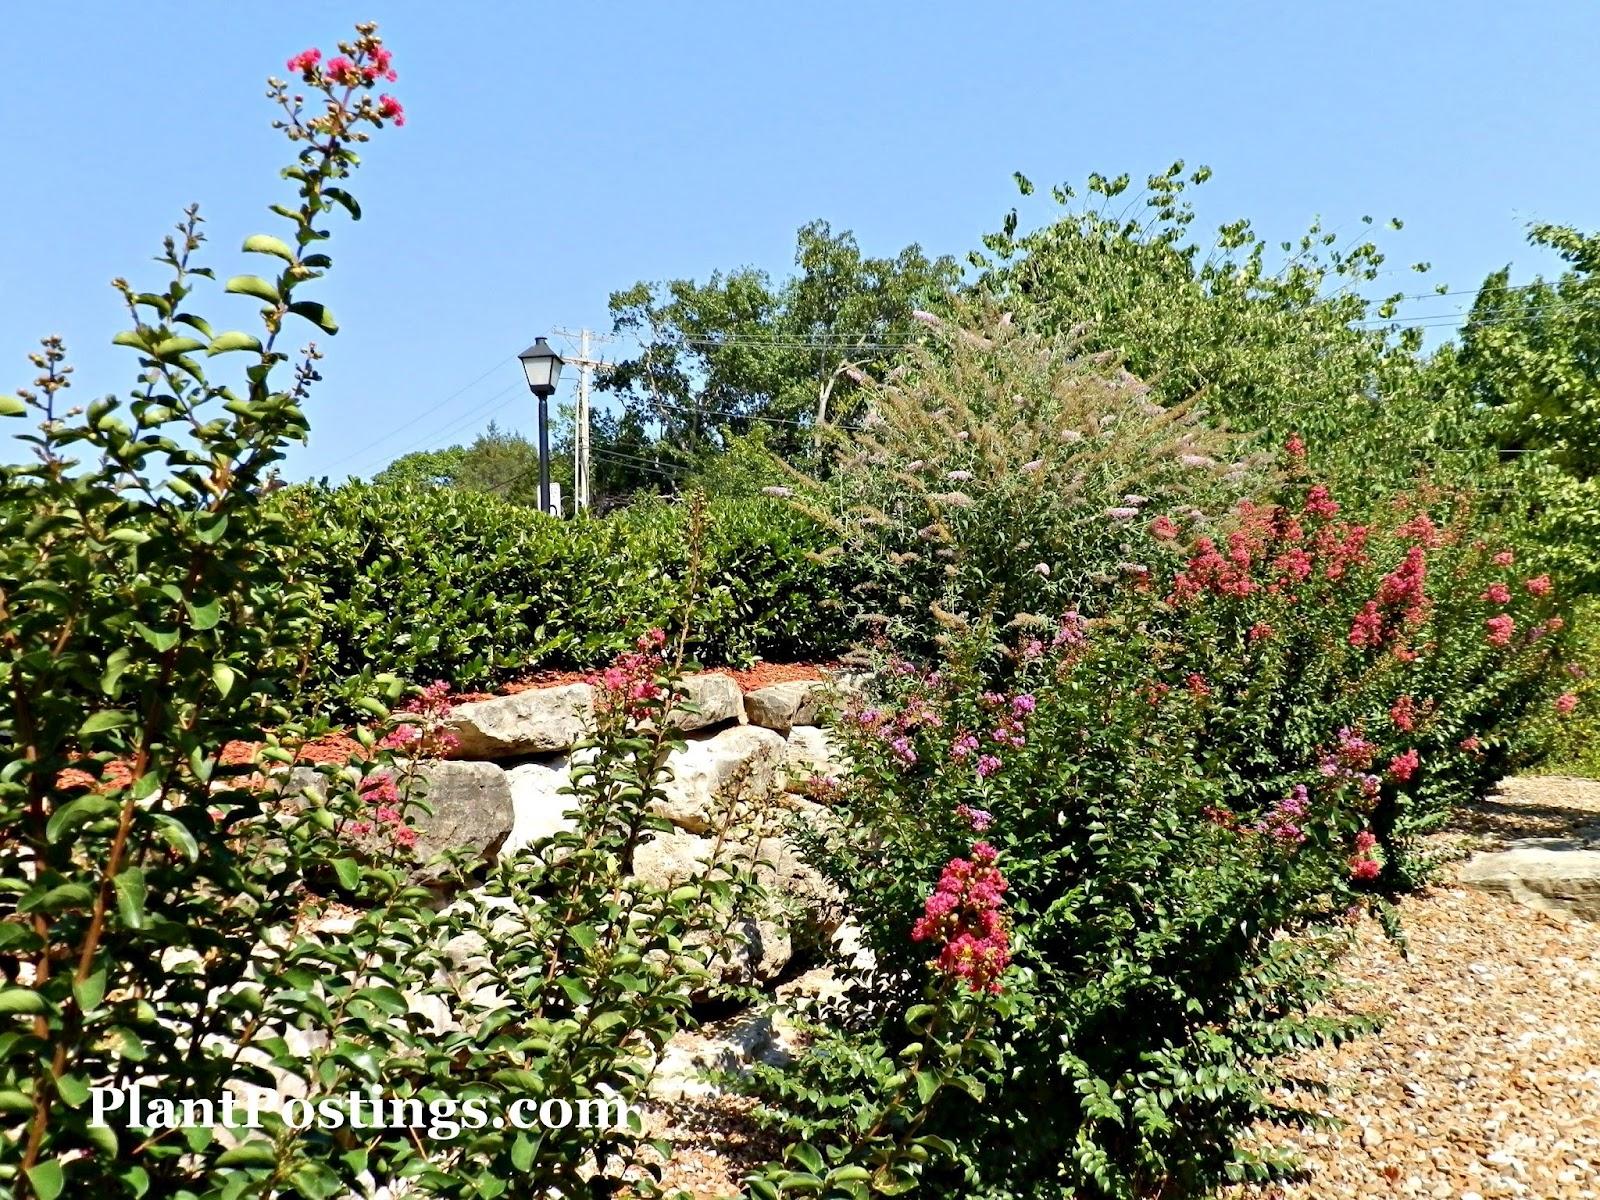 PlantPostings: Plant of the Month: Crape Myrtle